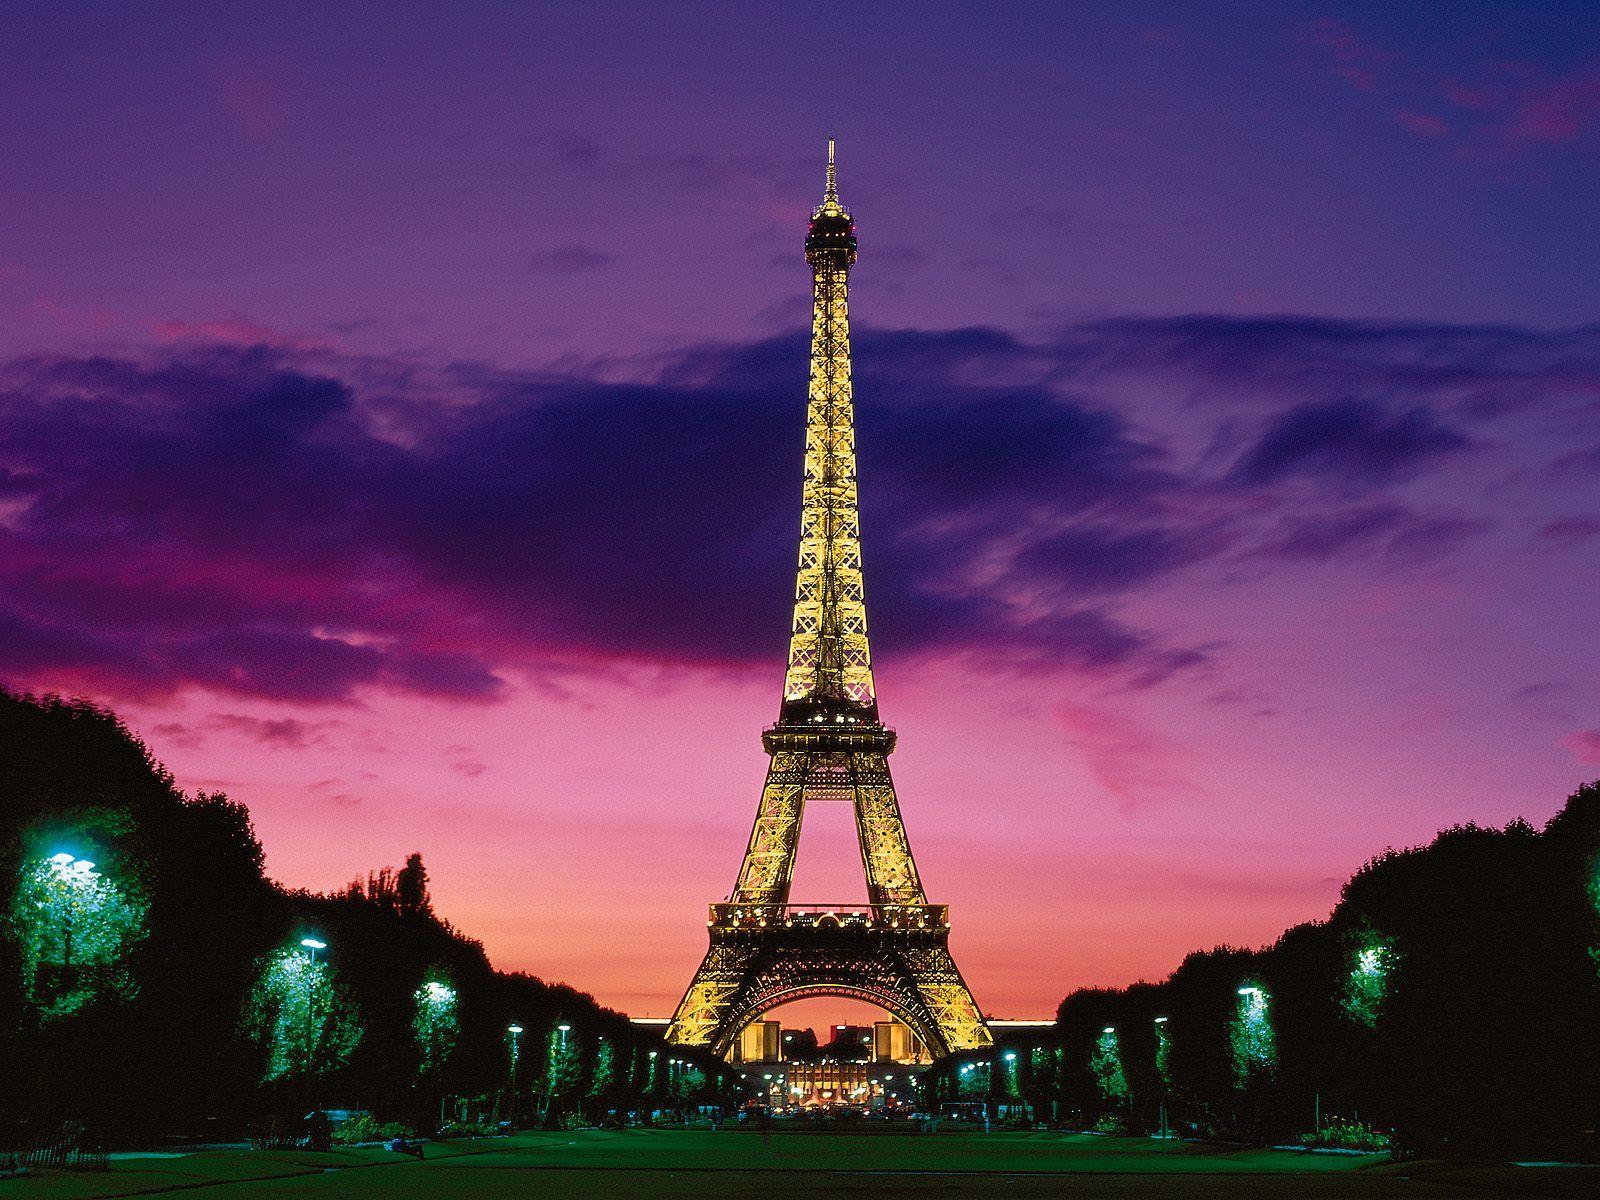 The Eiffel Tower <3 my biggest dream :)